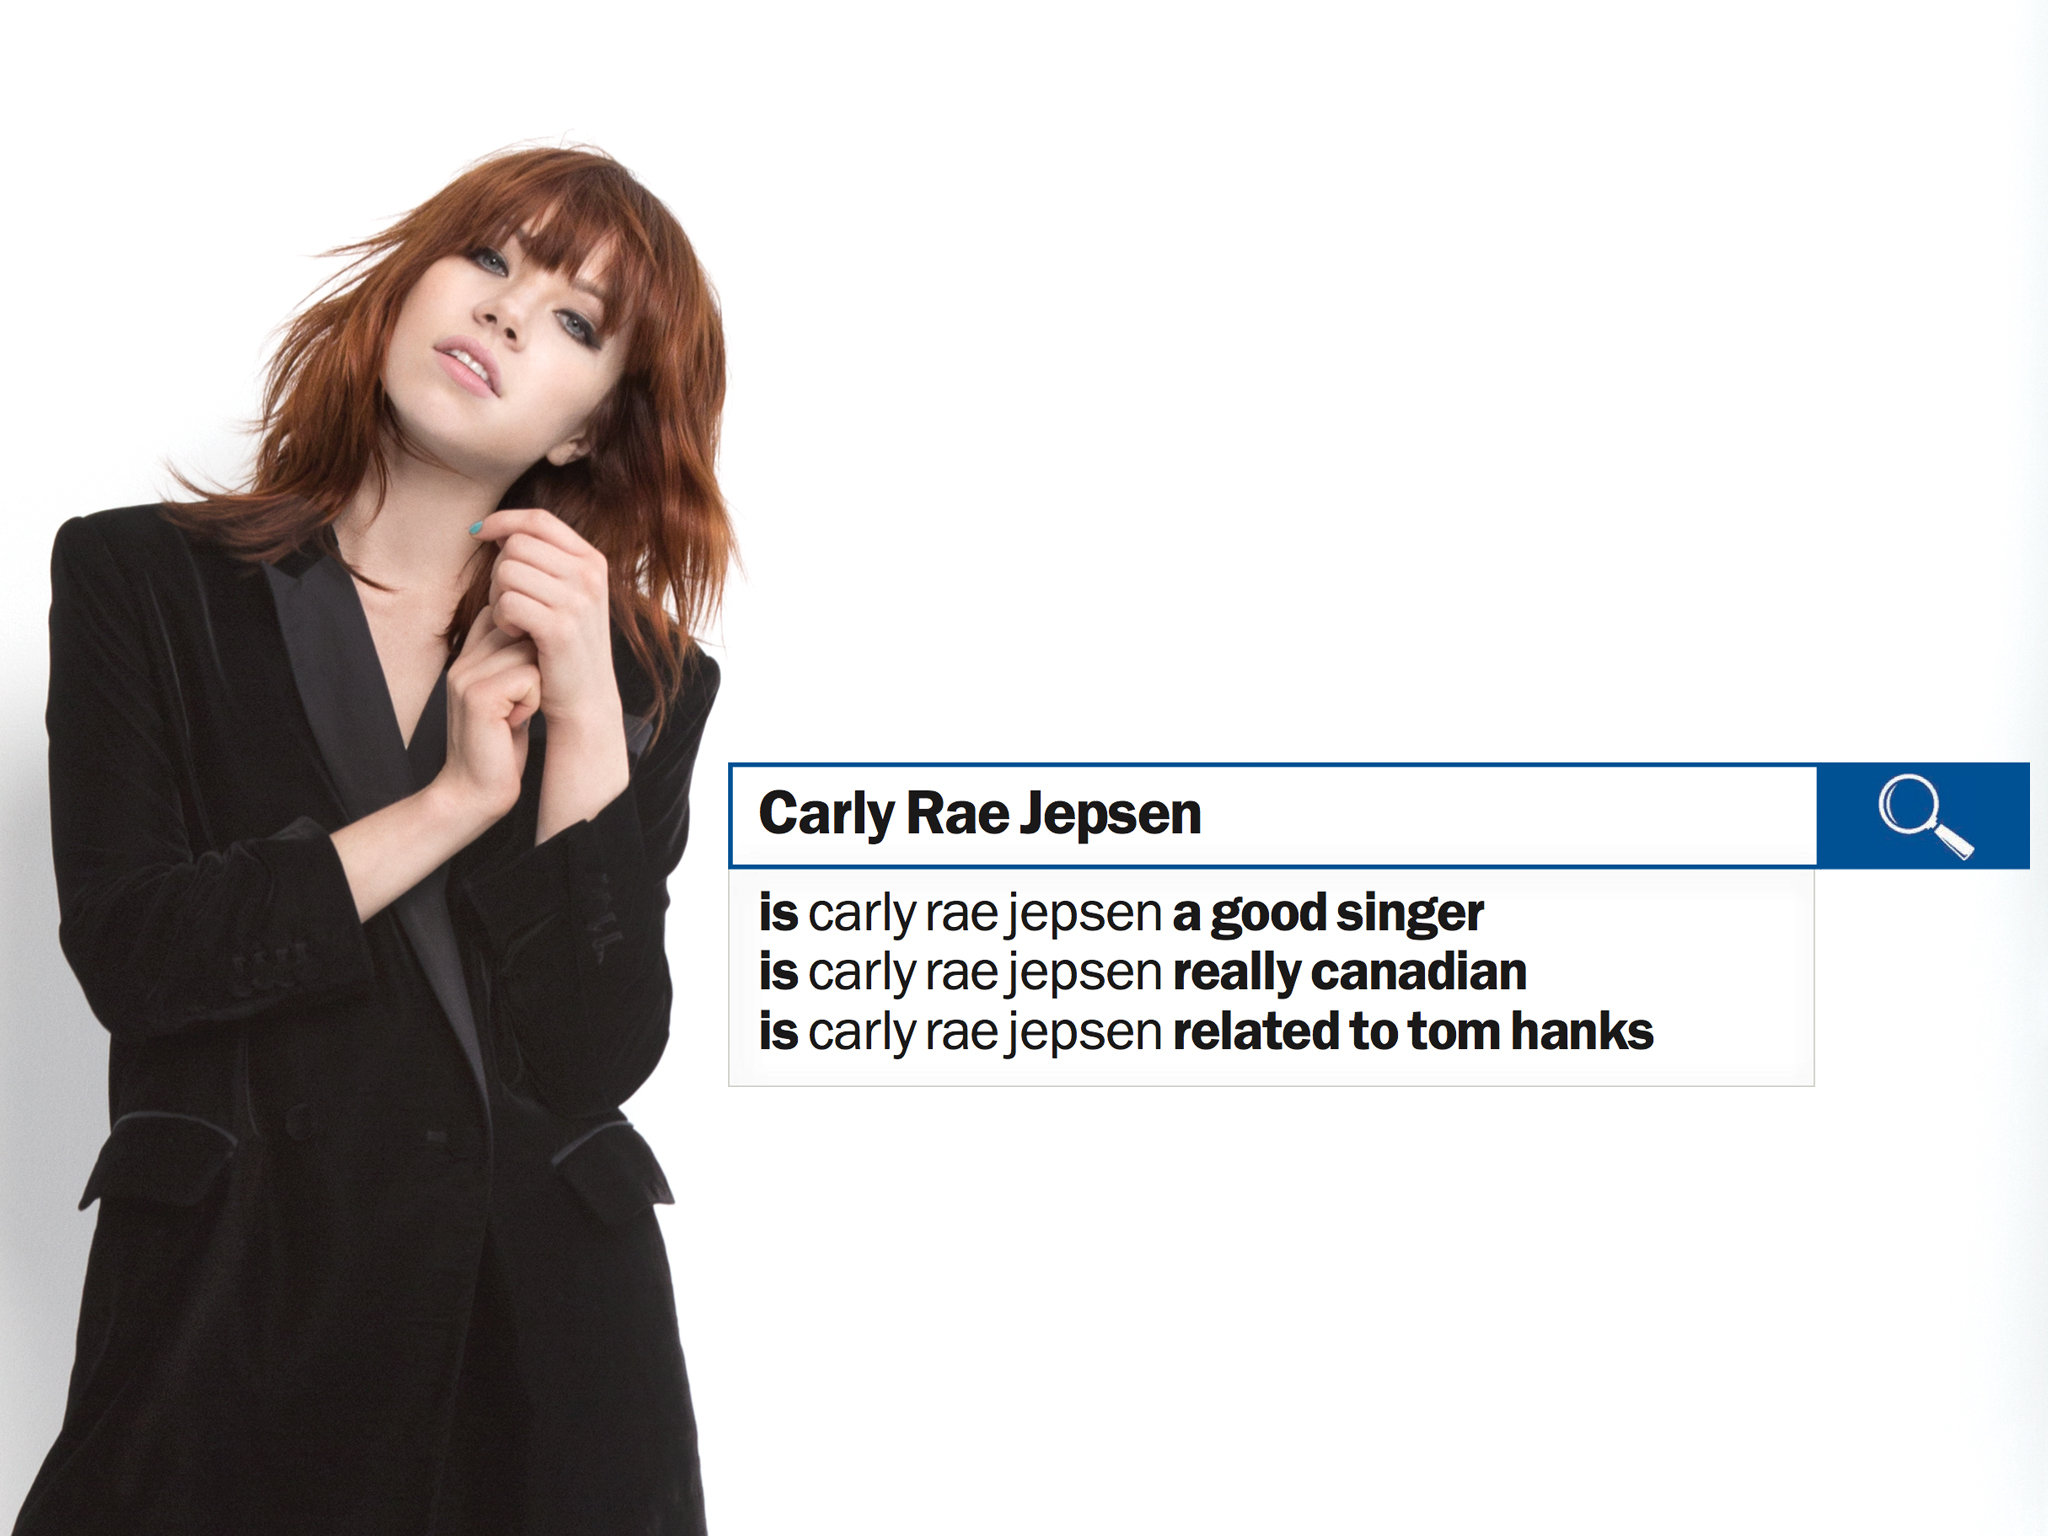 The internet interviews Carly Rae Jepsen